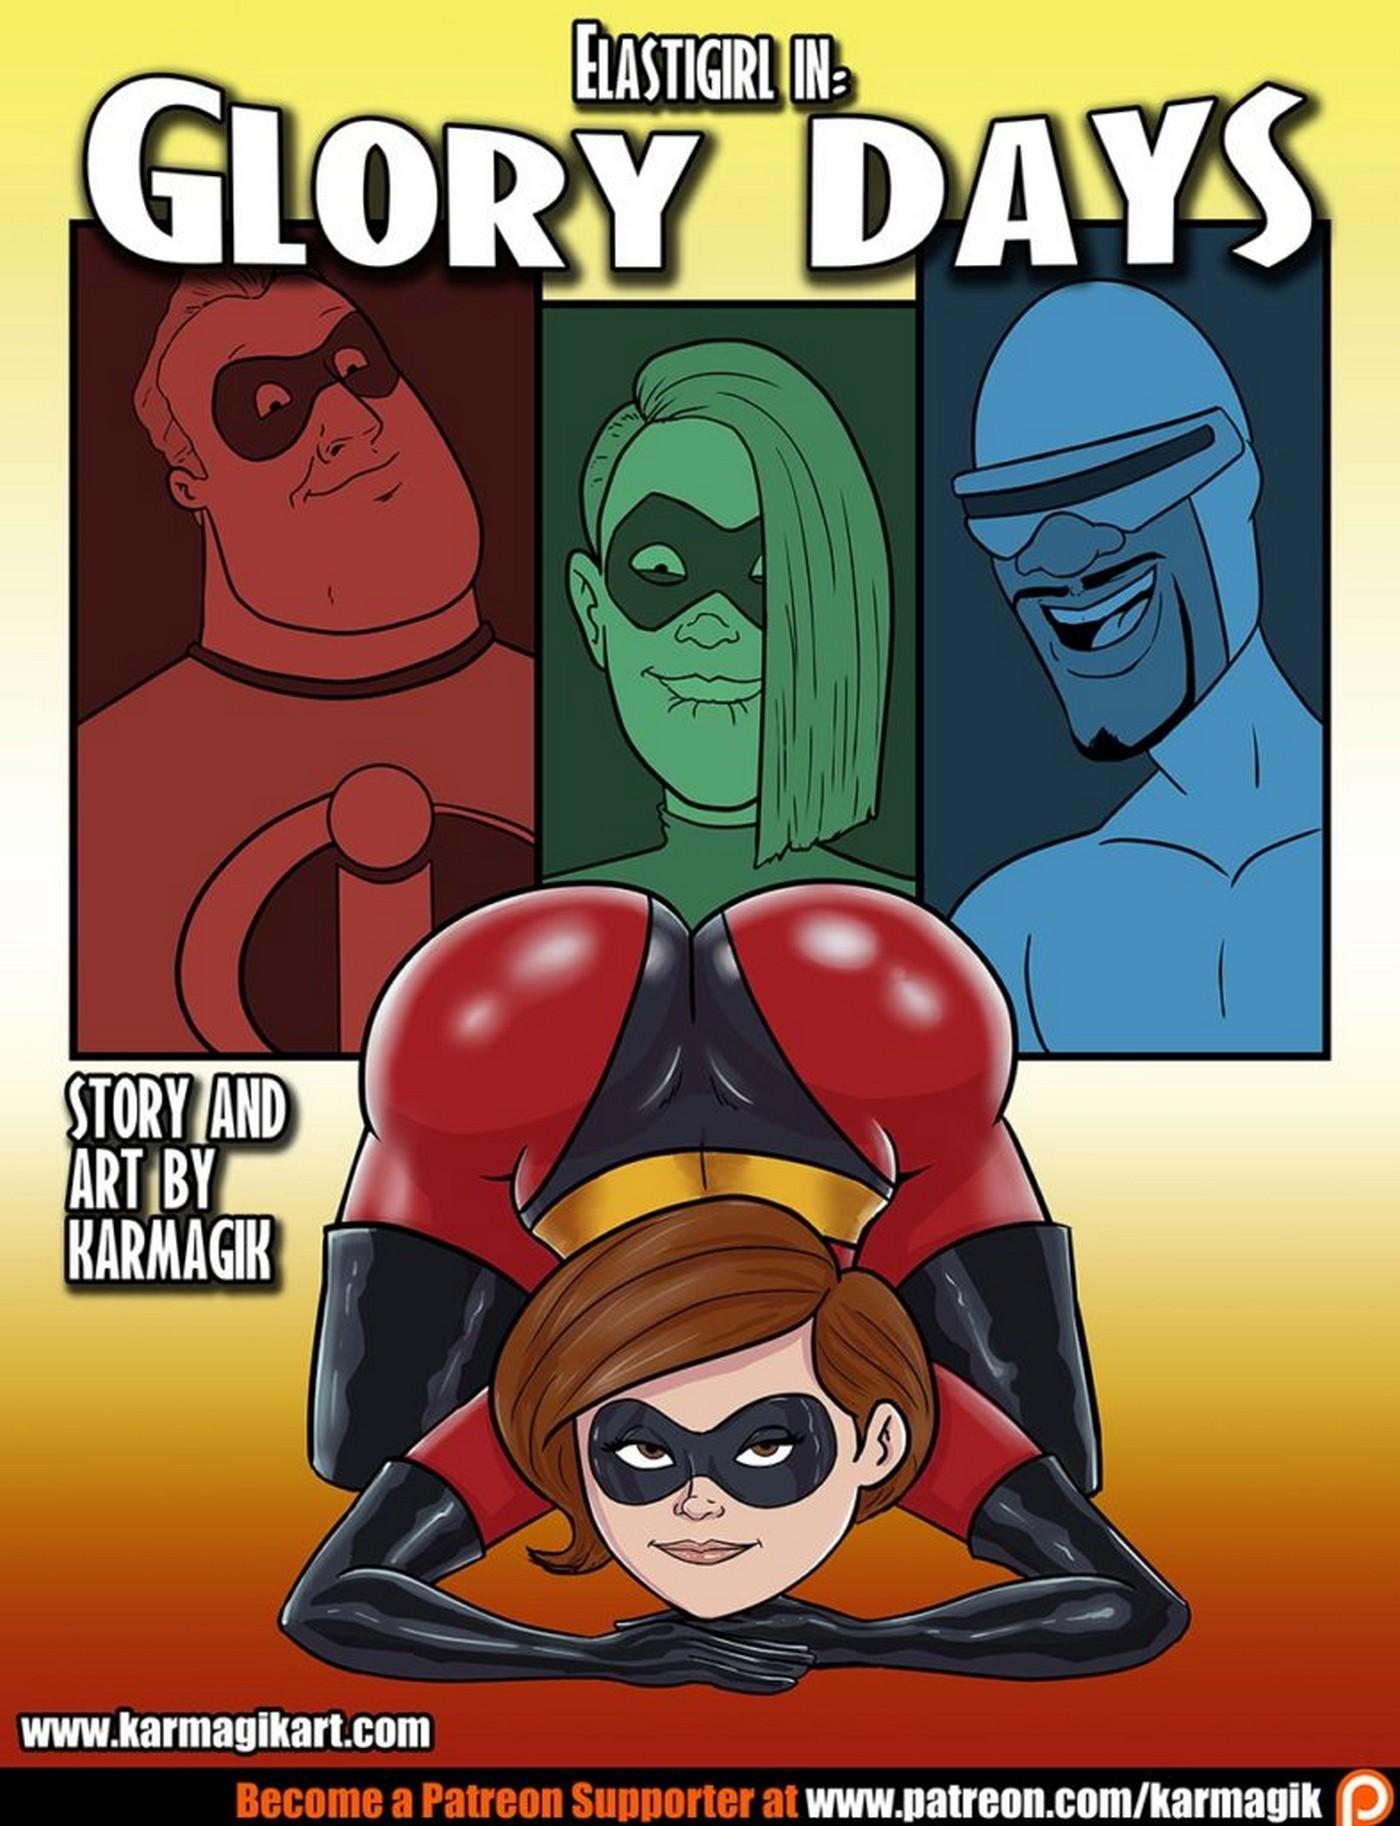 The Incredibles Elastigirl in Glory Days 02